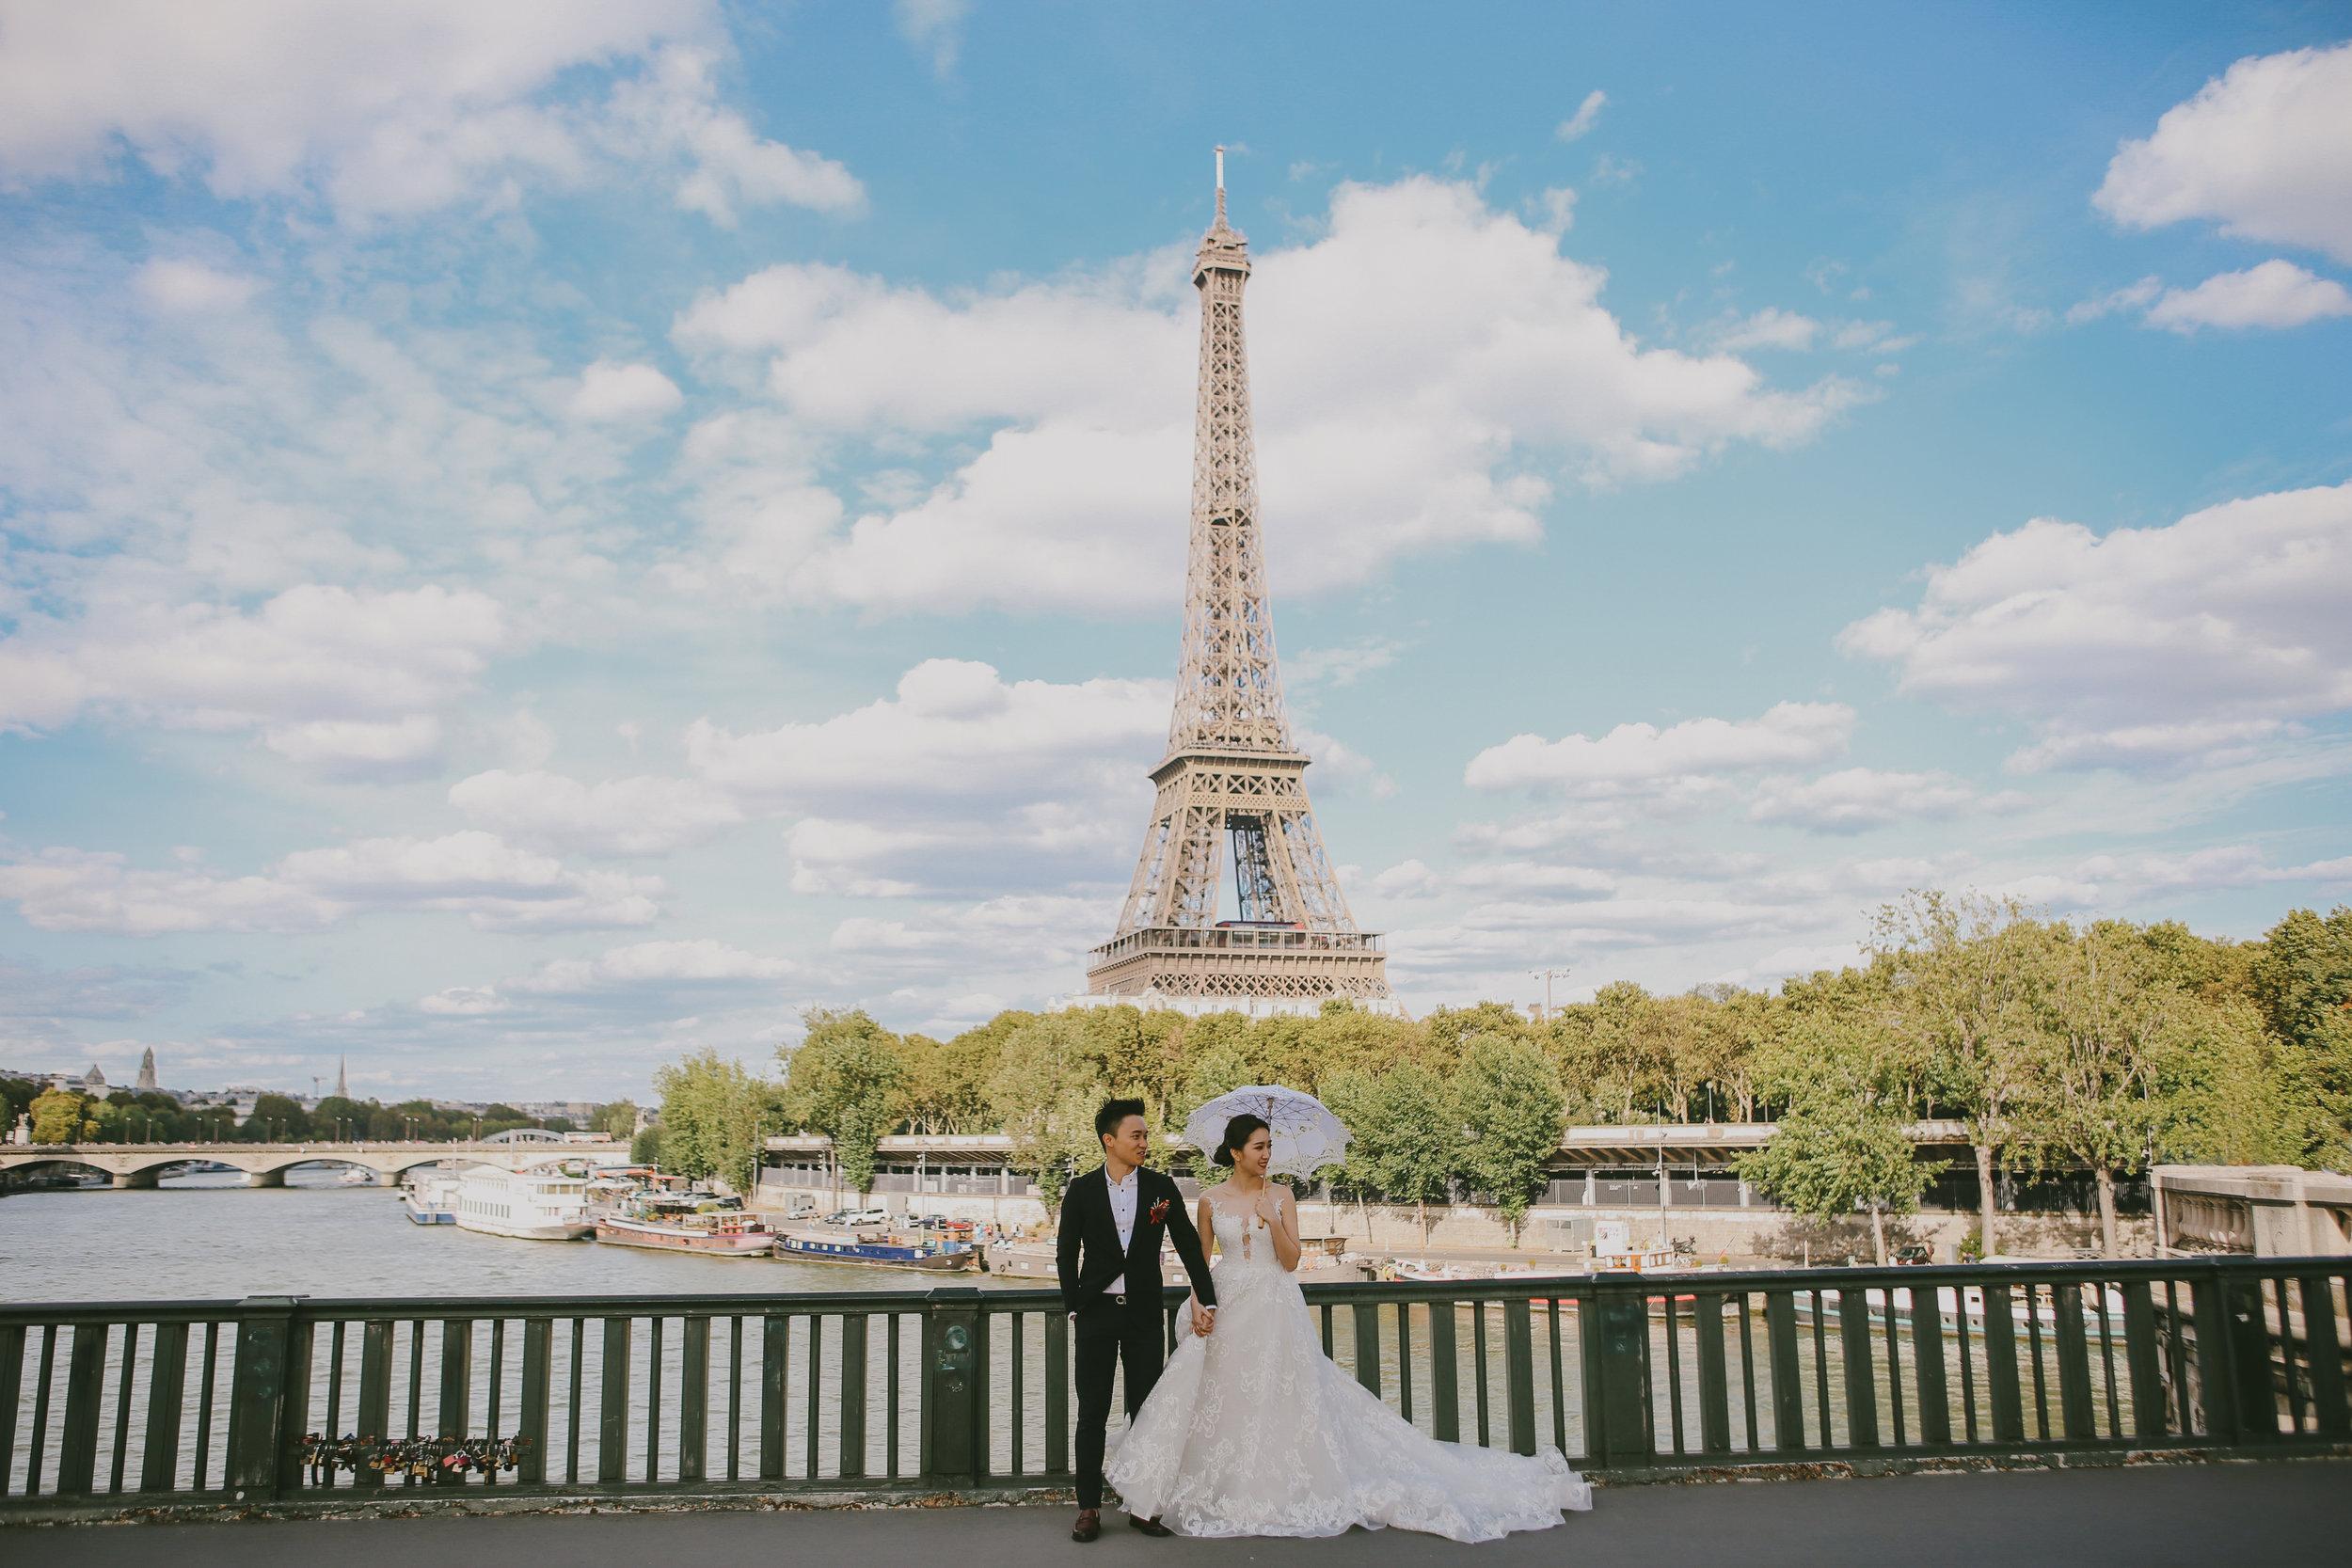 2018-pre-wedding-studio-numb9r-paris-high-1642e.jpg